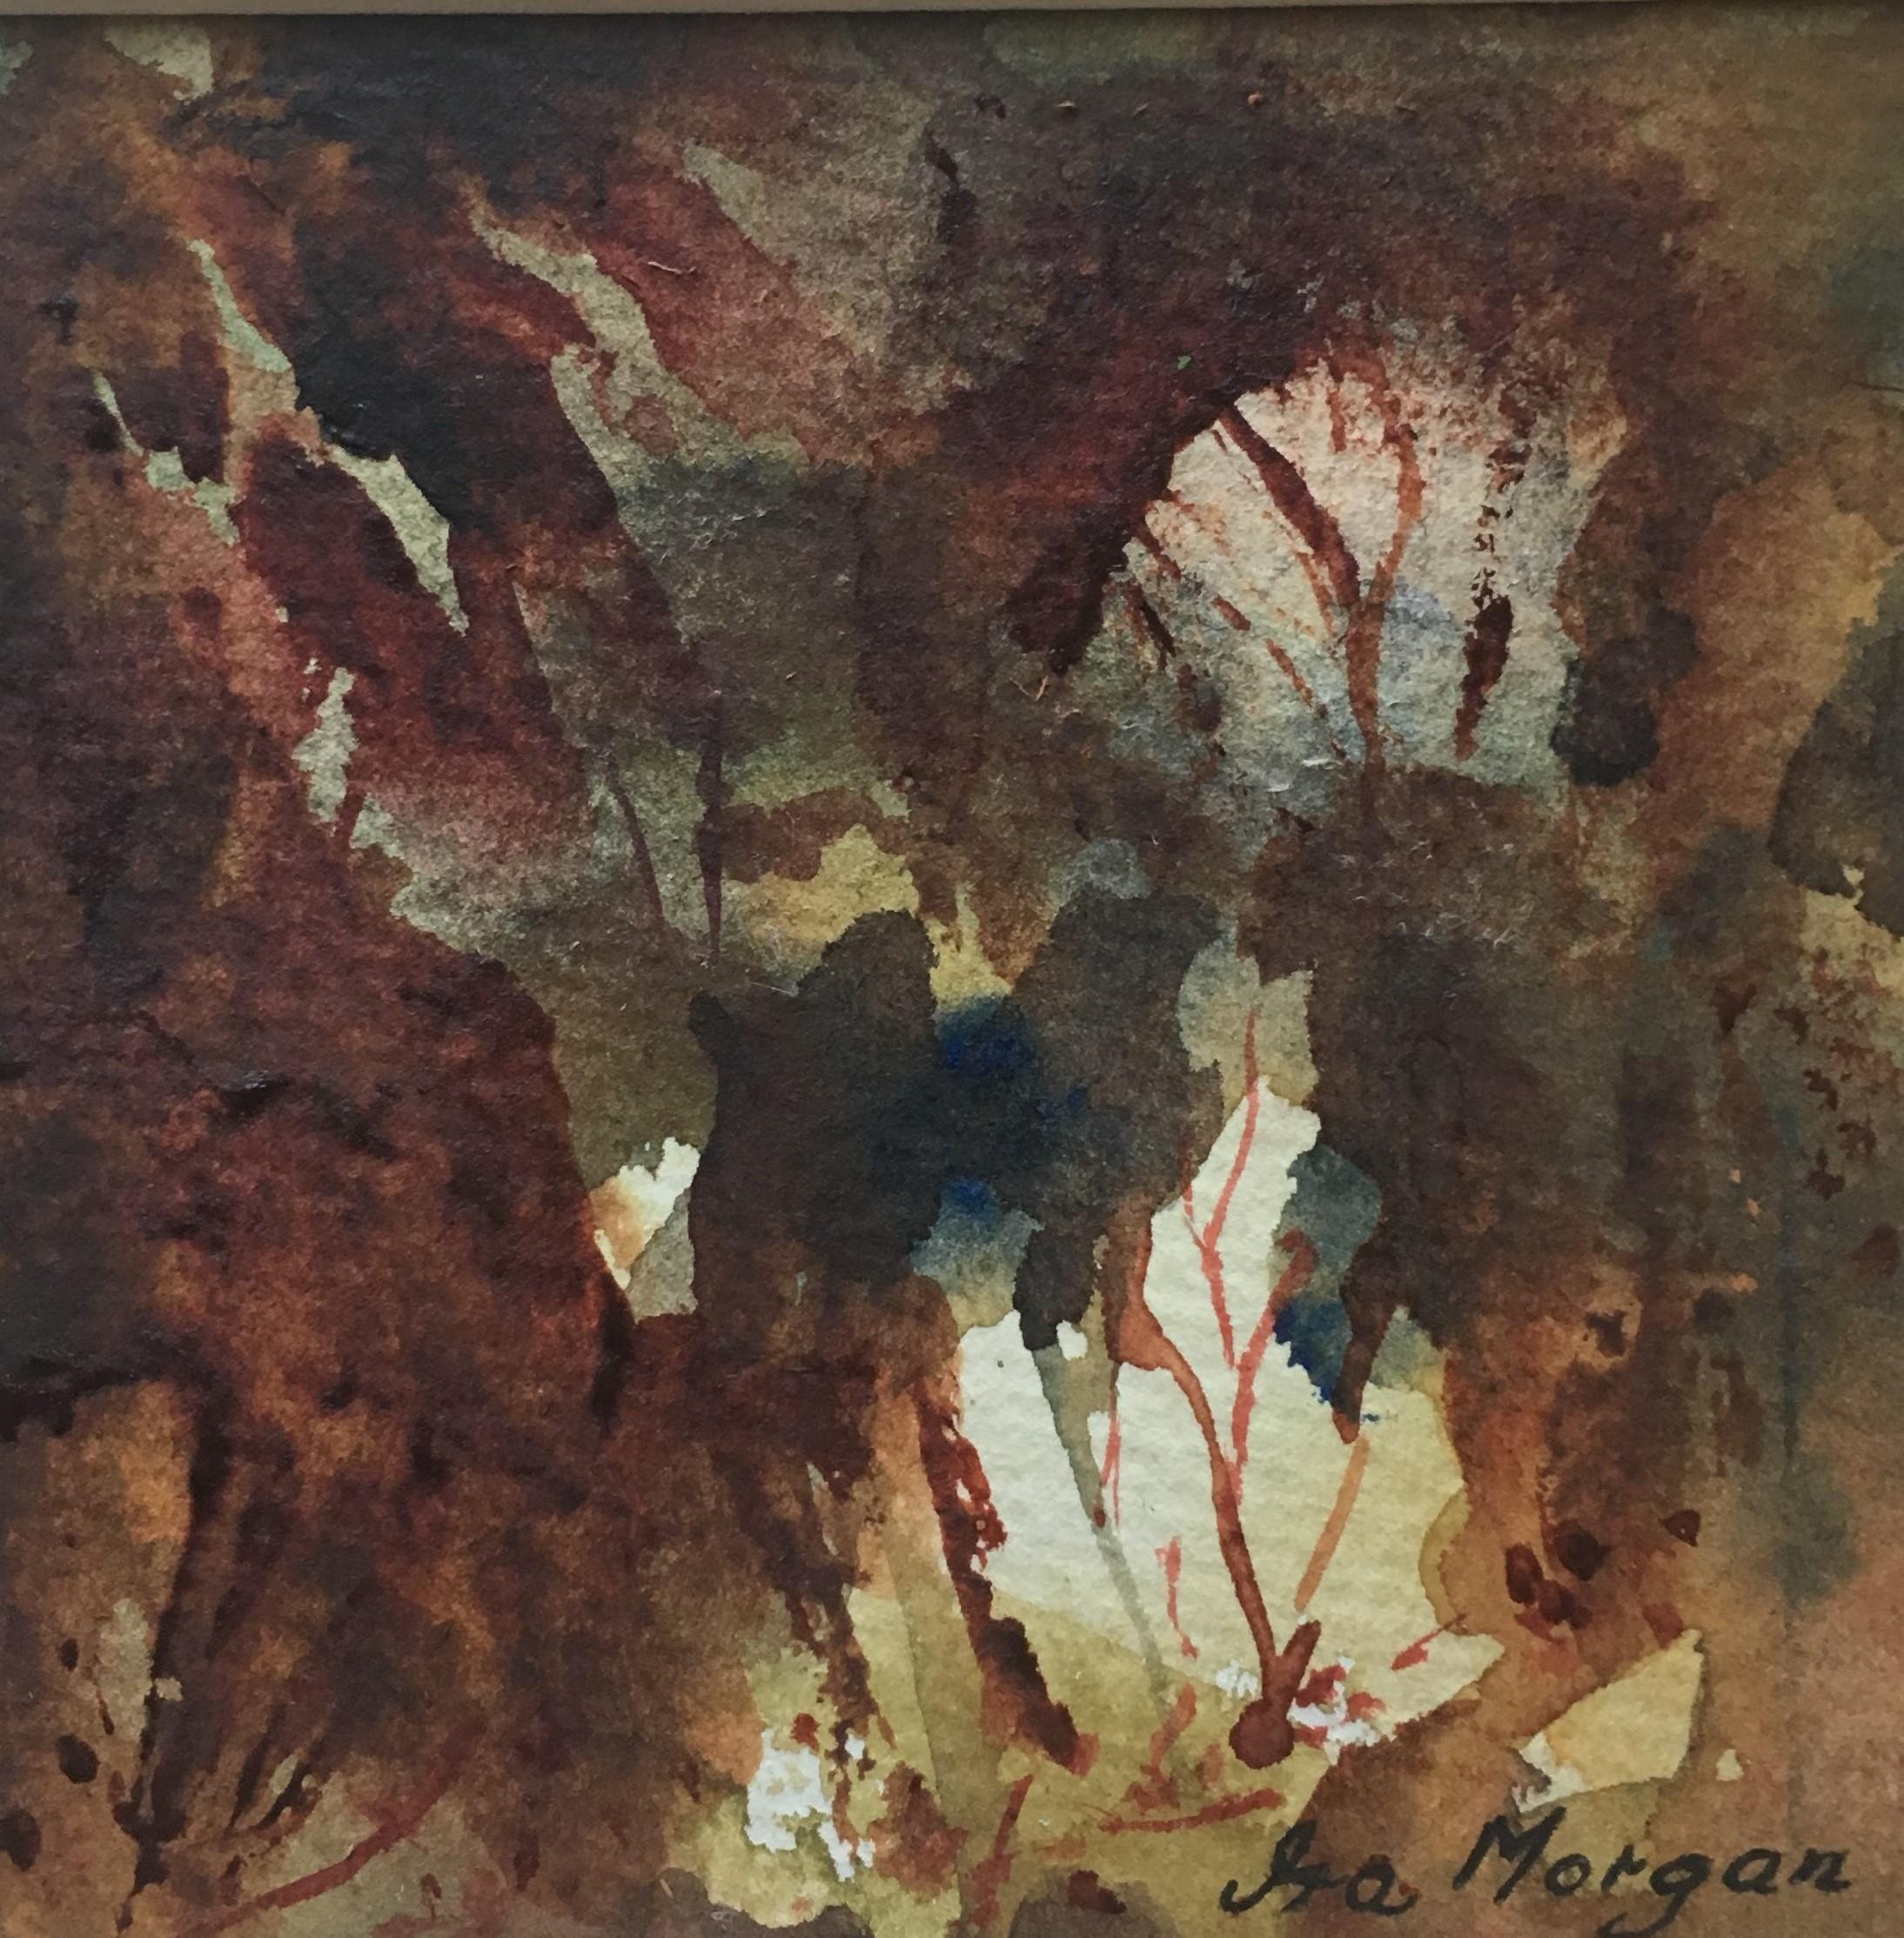 507. ' Tree tops 2' (2)